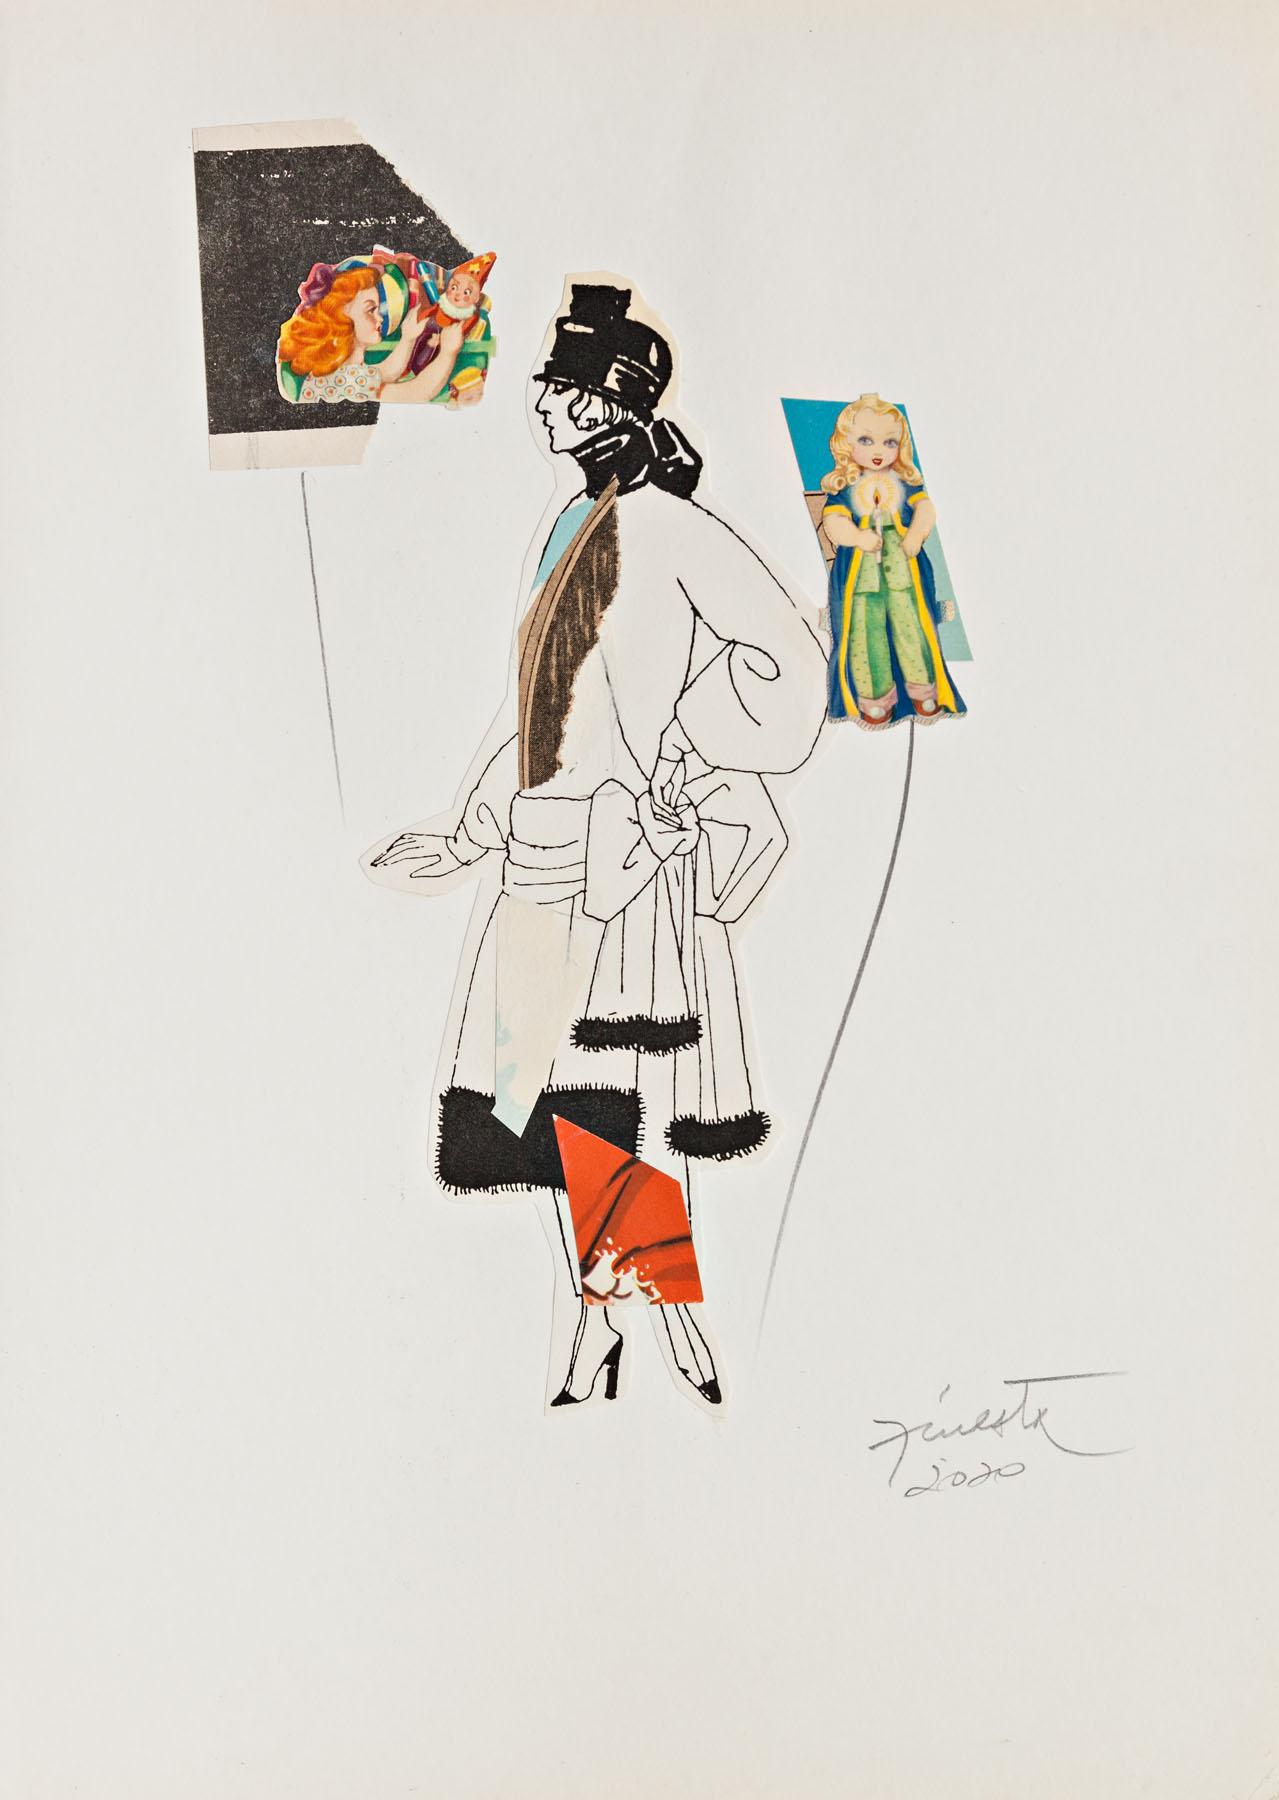 Serie verano, papel collage, 29,5 cm x 21 cm, 2020